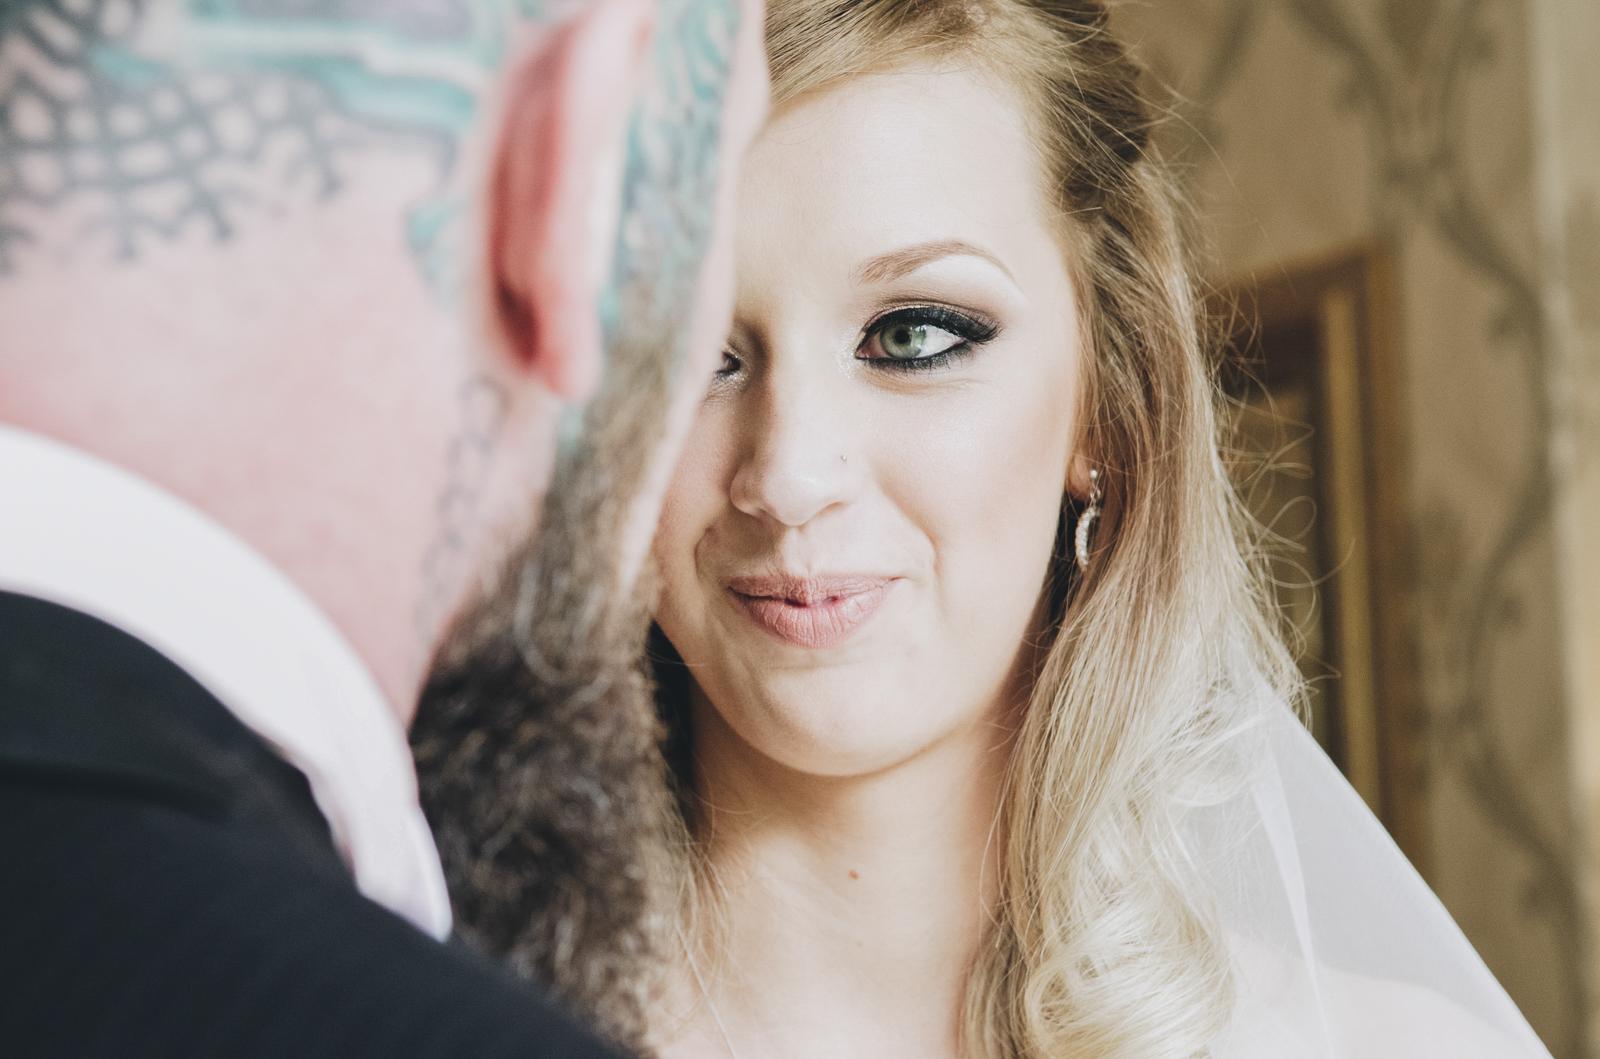 Alternative-North-West-Manchester-Wedding-Photography-Astley-bank-Wedding-skull-cake-tattooed-groom-11.jpg